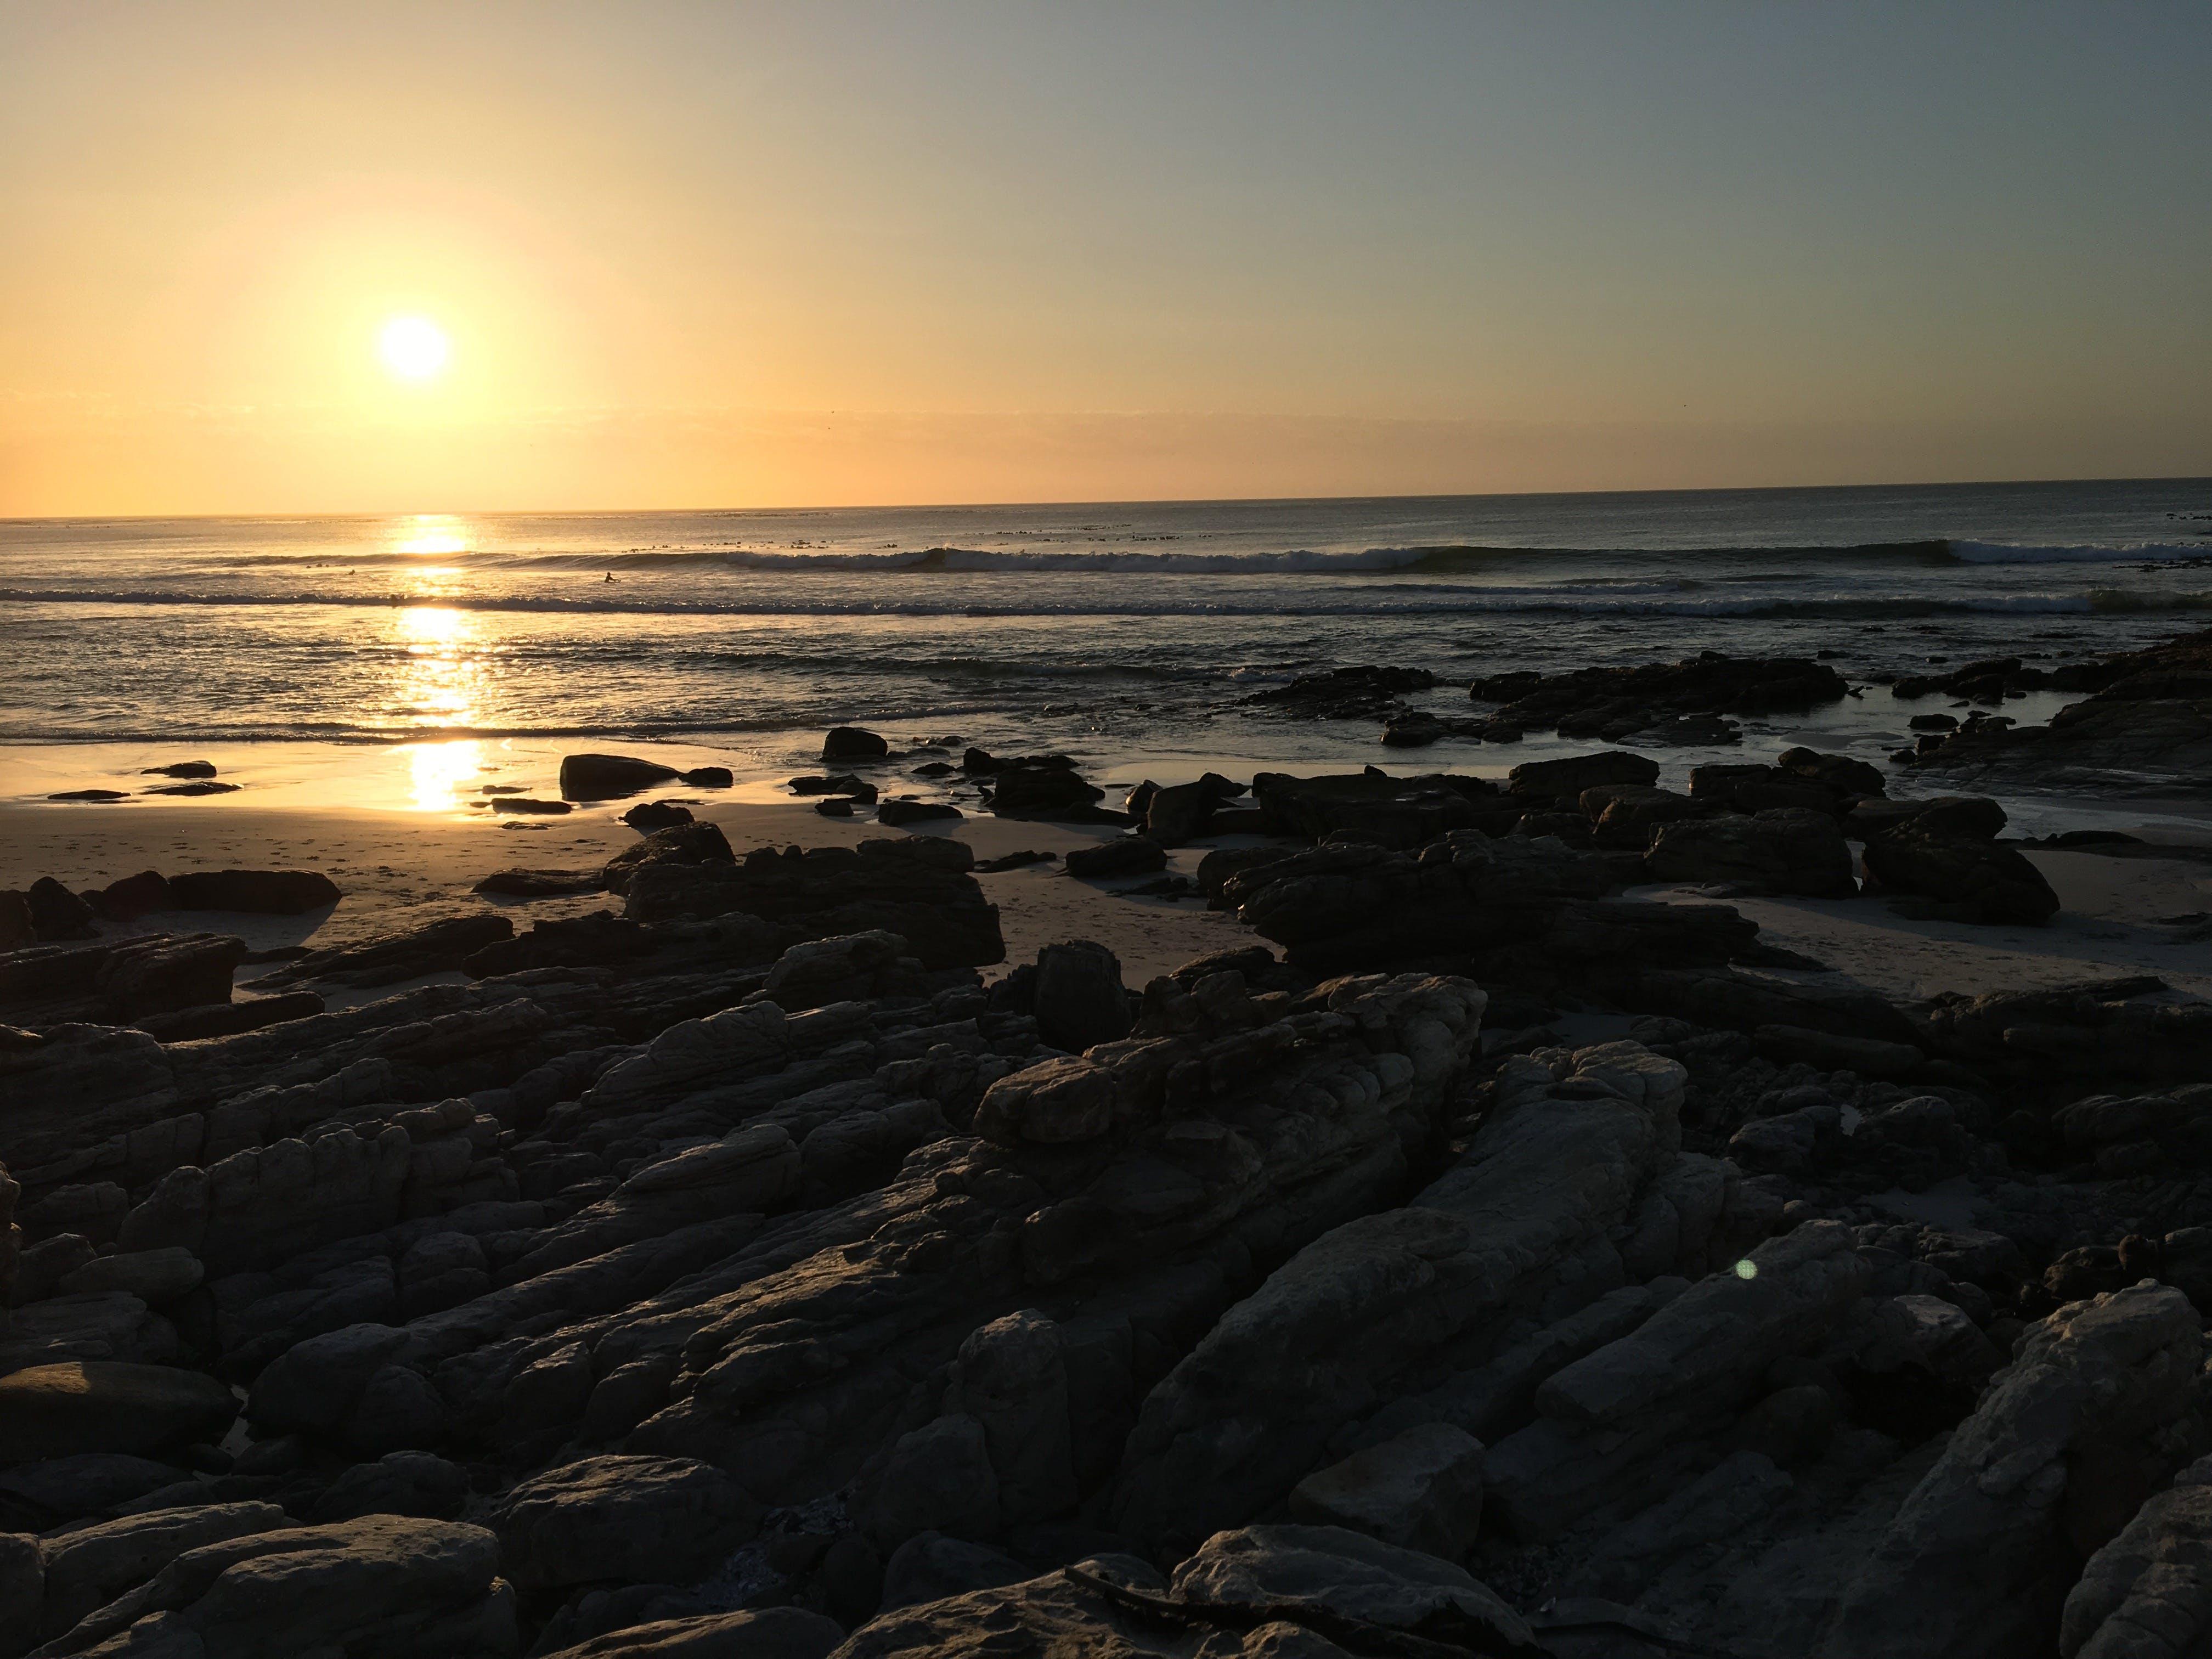 Free stock photo of beach, golden sunset, rocks, south africa